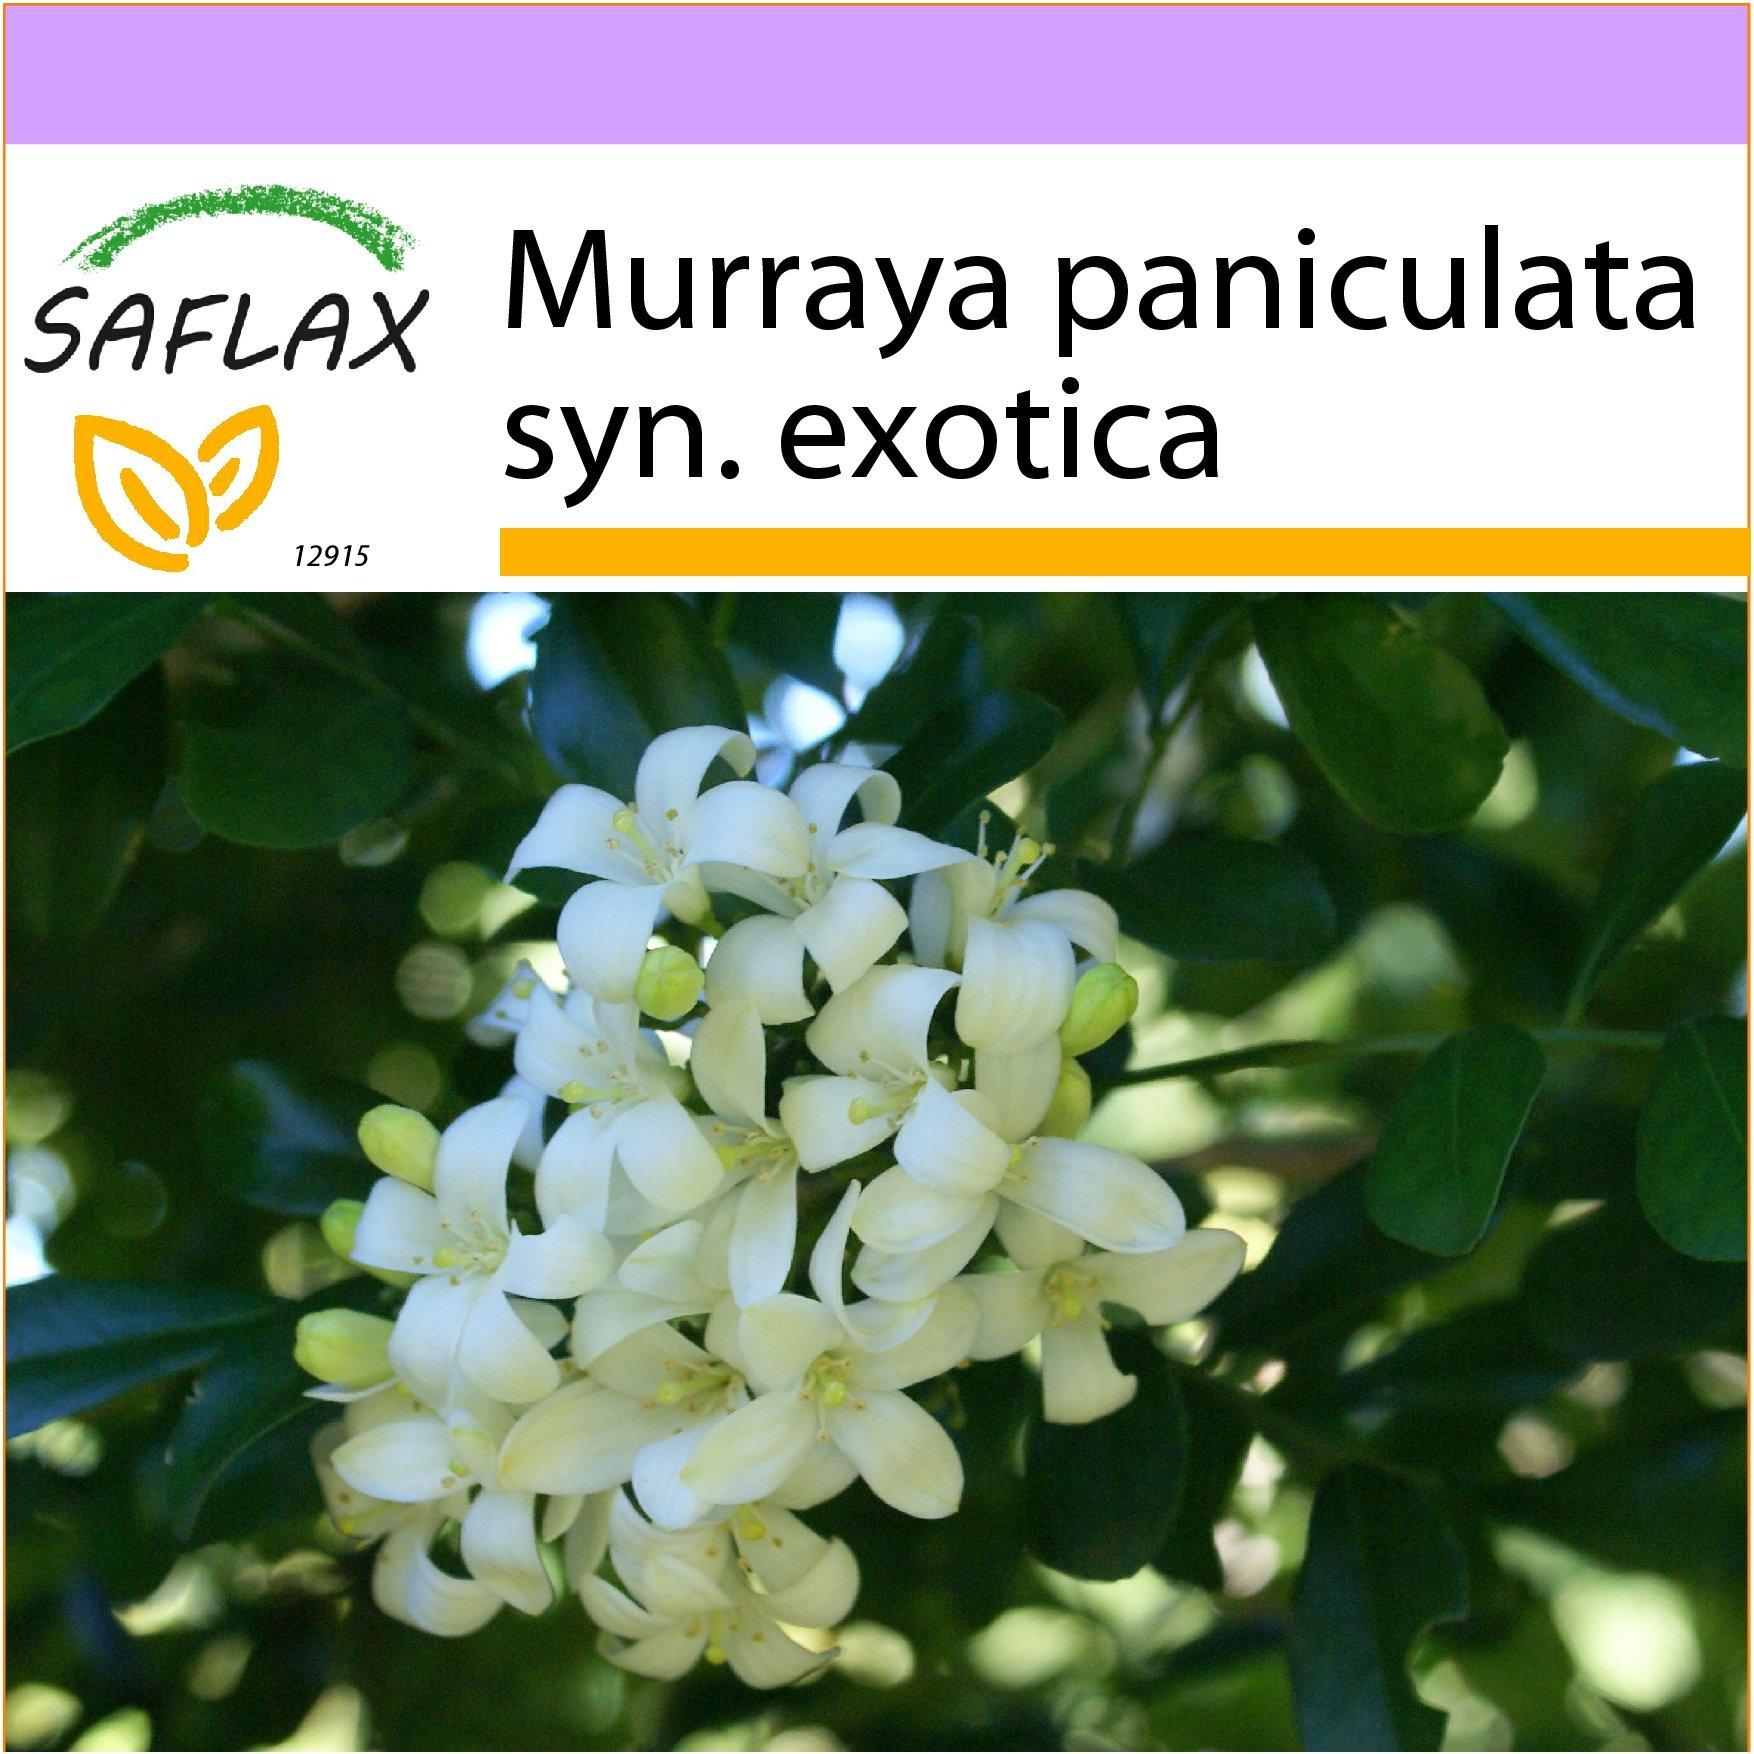 SAFLAX - Naranjo jazmín - 12 semillas - Murraya paniculata: Amazon ...